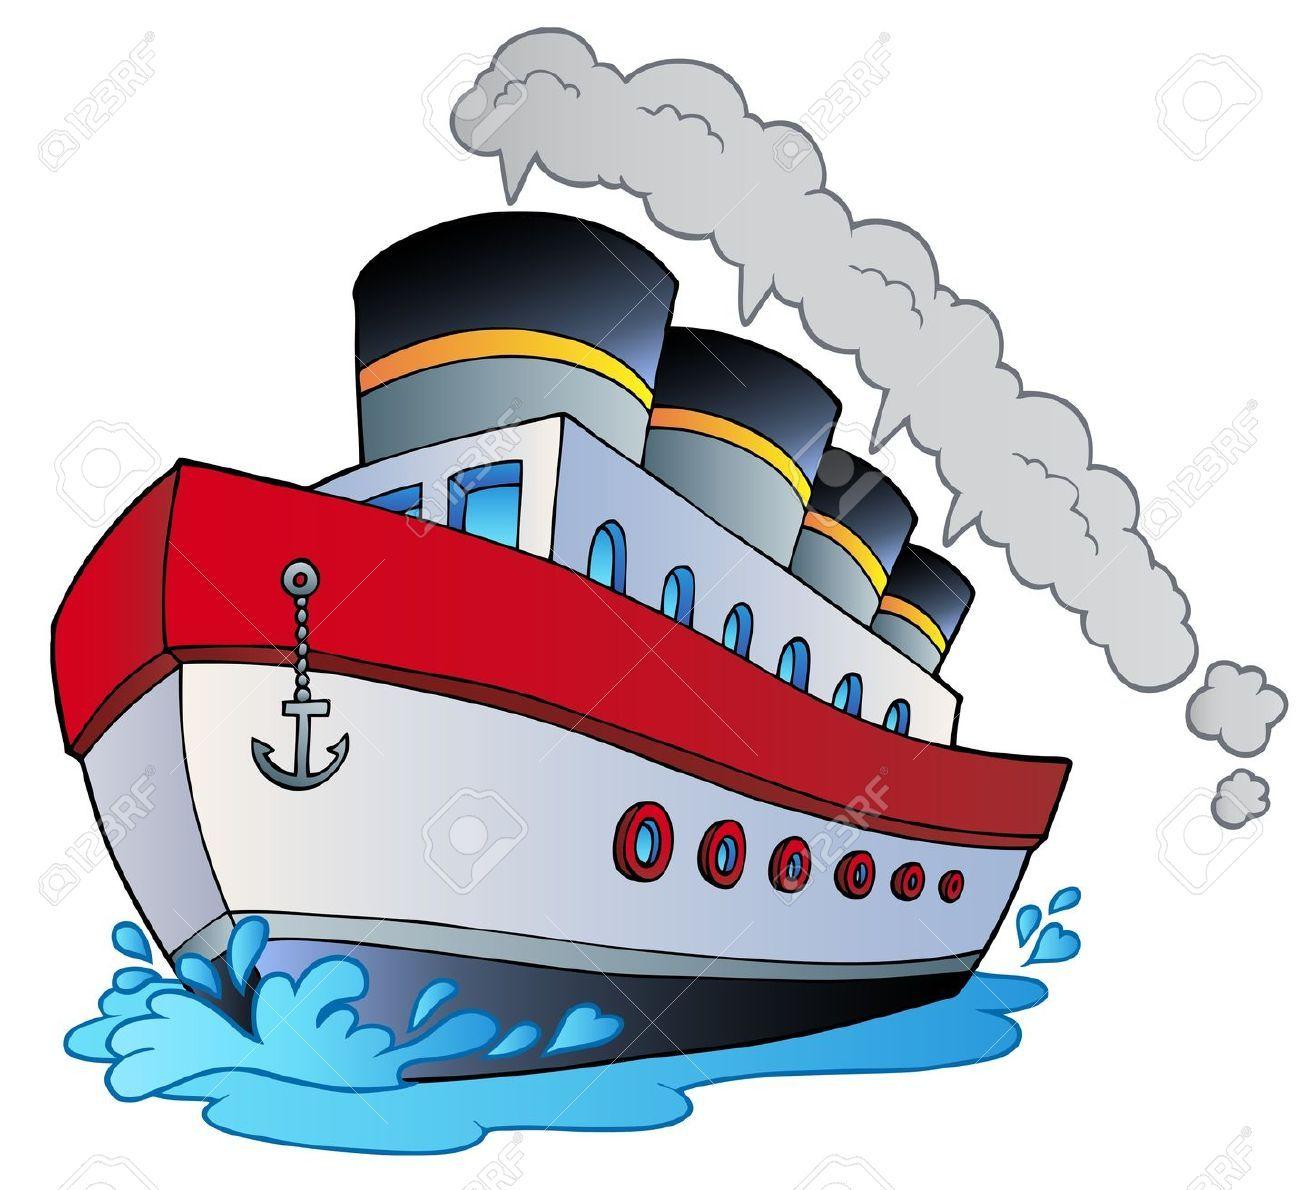 Venngage Editor Boat Cartoon Cartoon Ships Cartoon